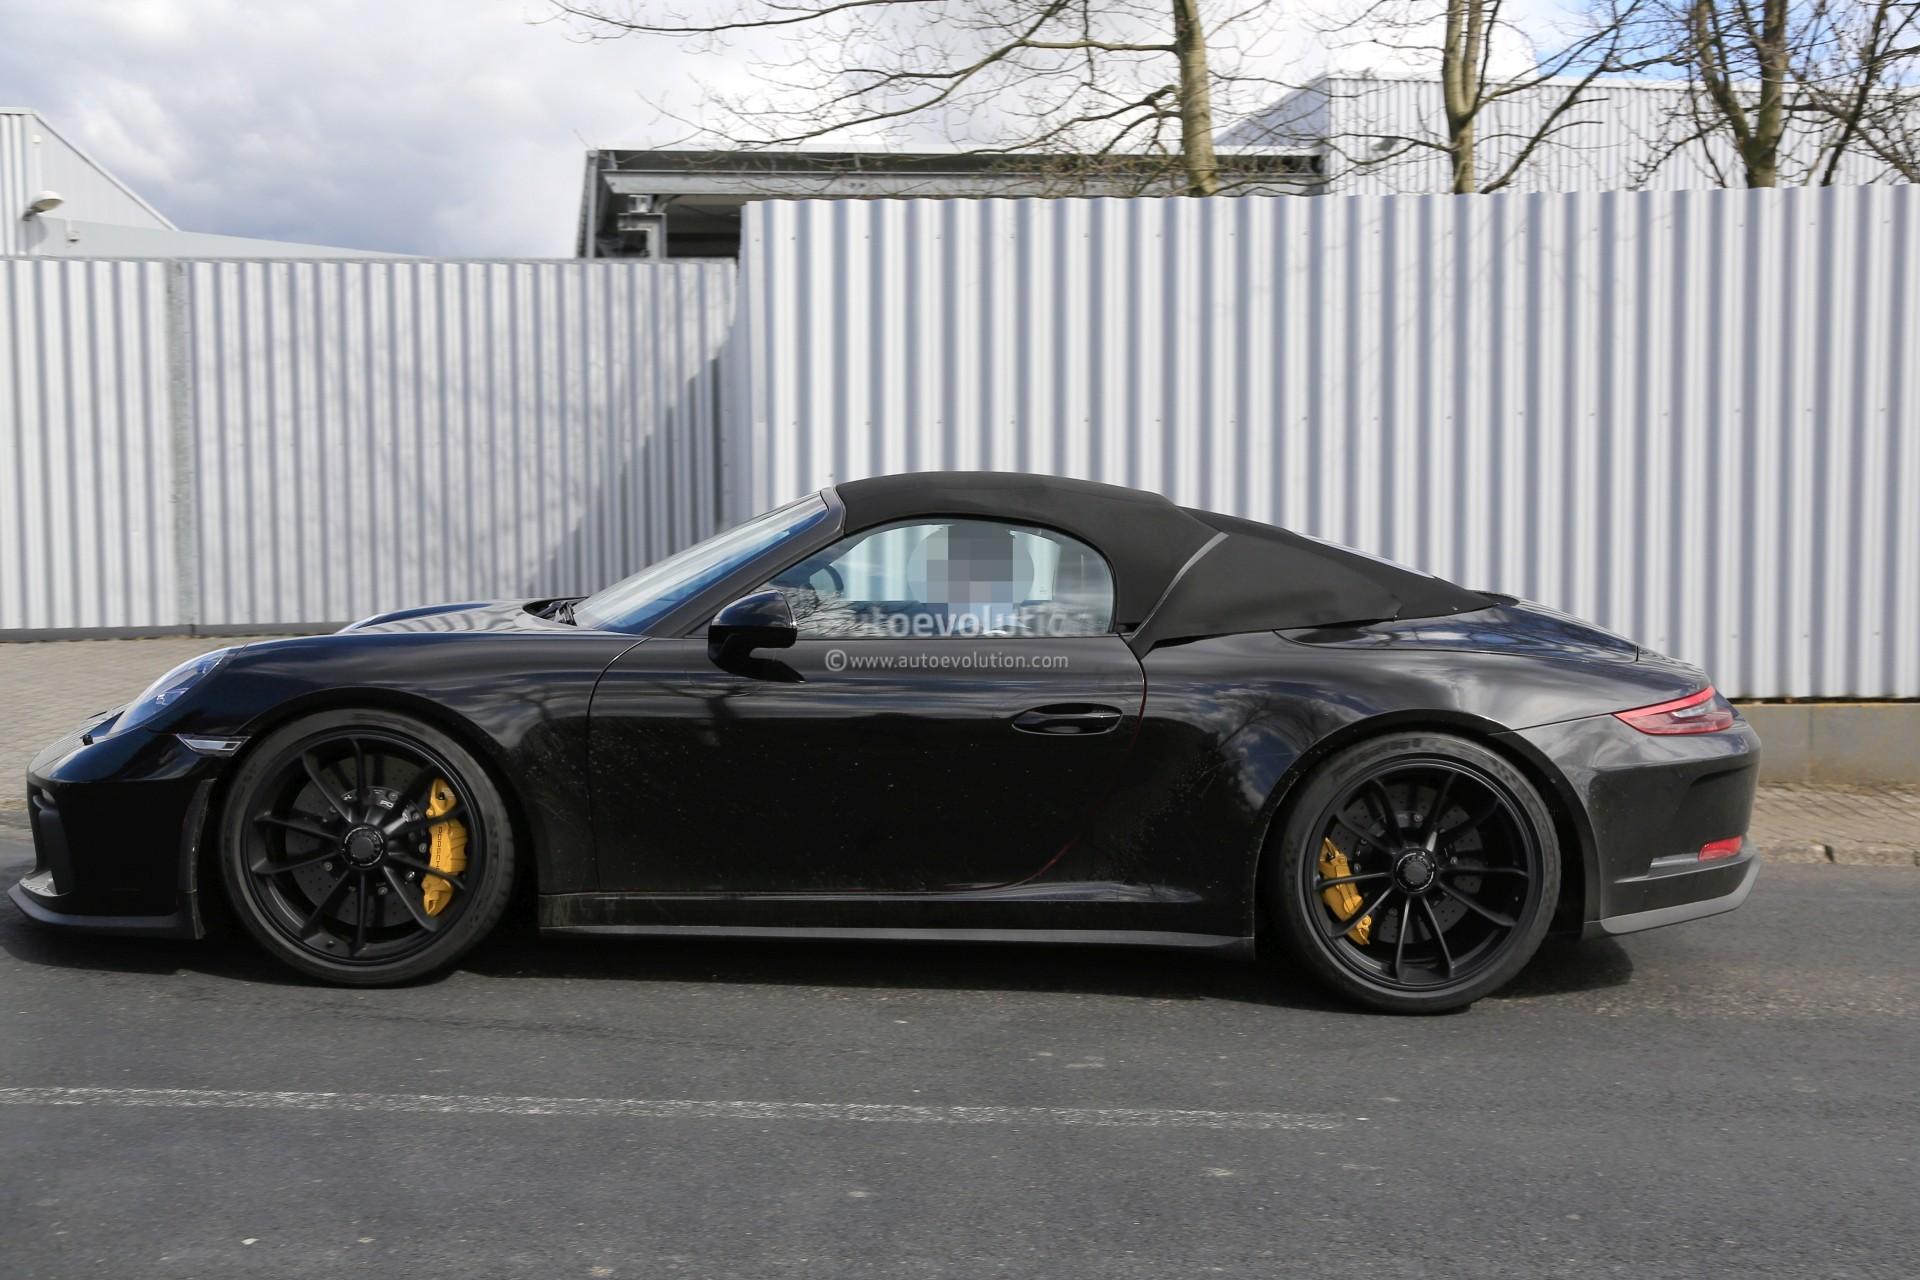 Spyshots 2019 Porsche 911 Speedster Looks Like A Gt3 Cabriolet Manual Rumored Autoevolution